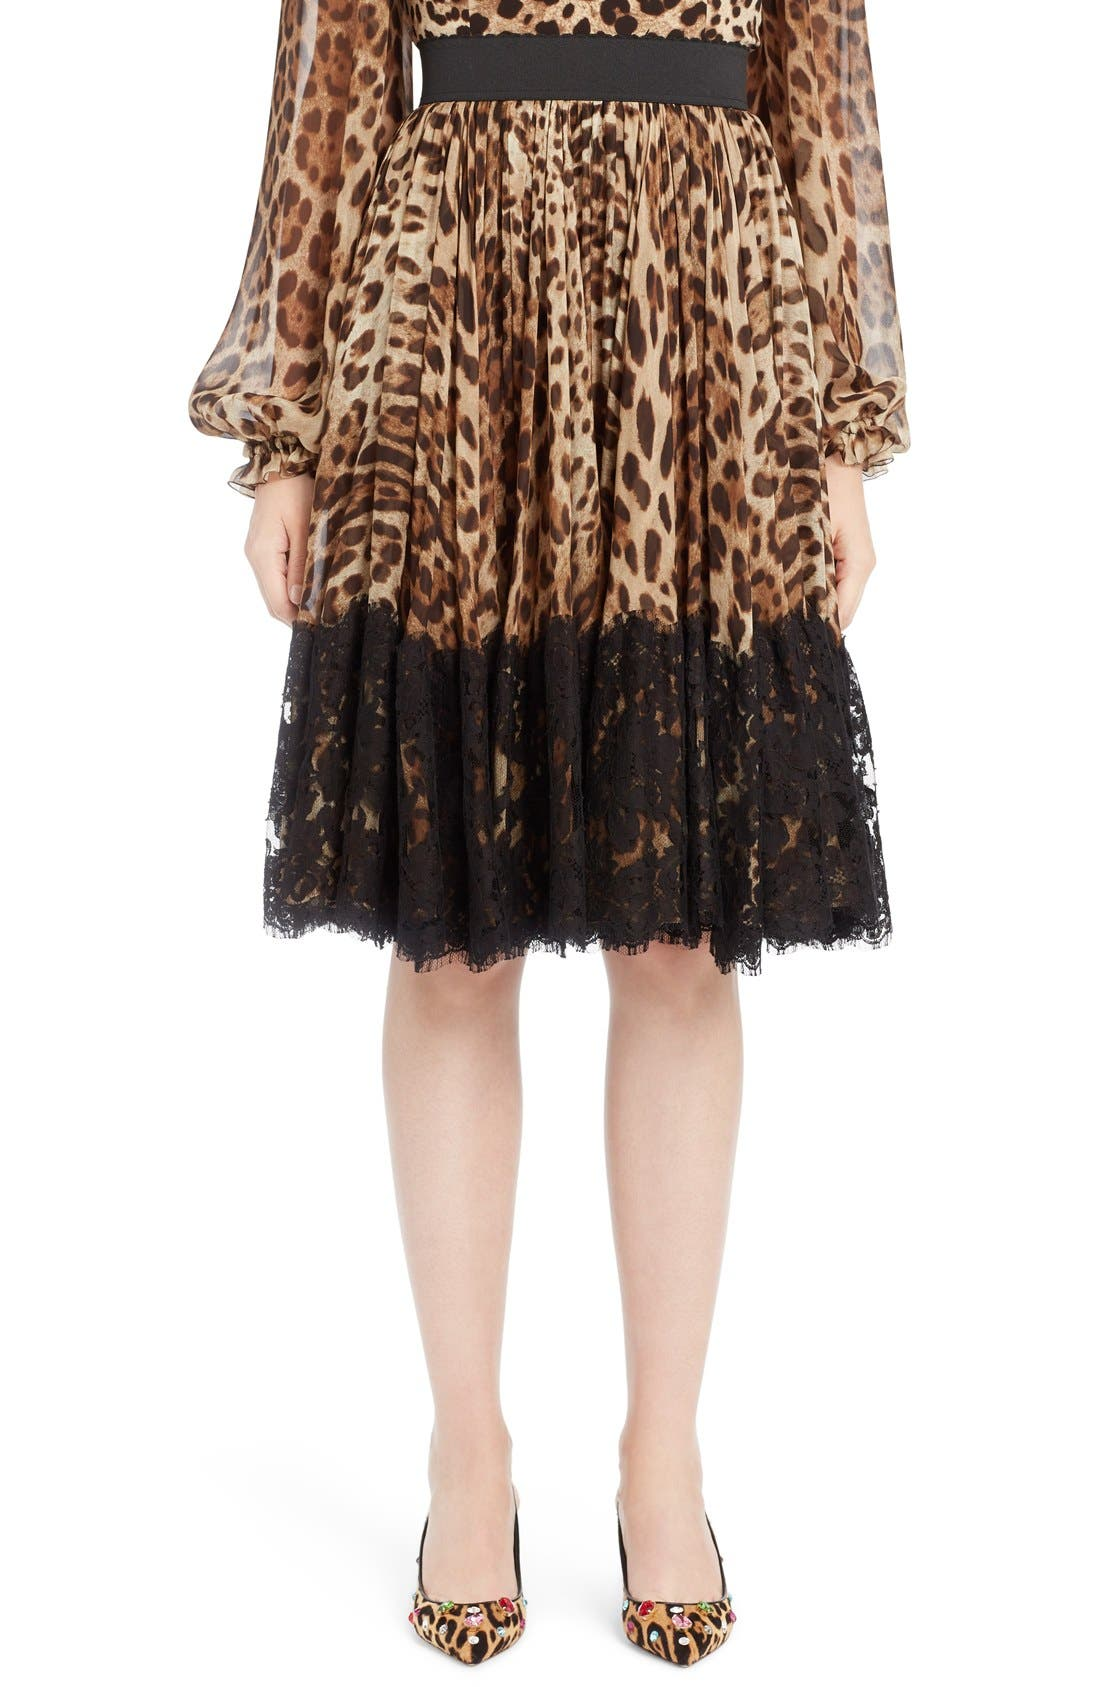 Dolce&Gabbana Lace Overlay Leopard Print Chiffon Full Skirt